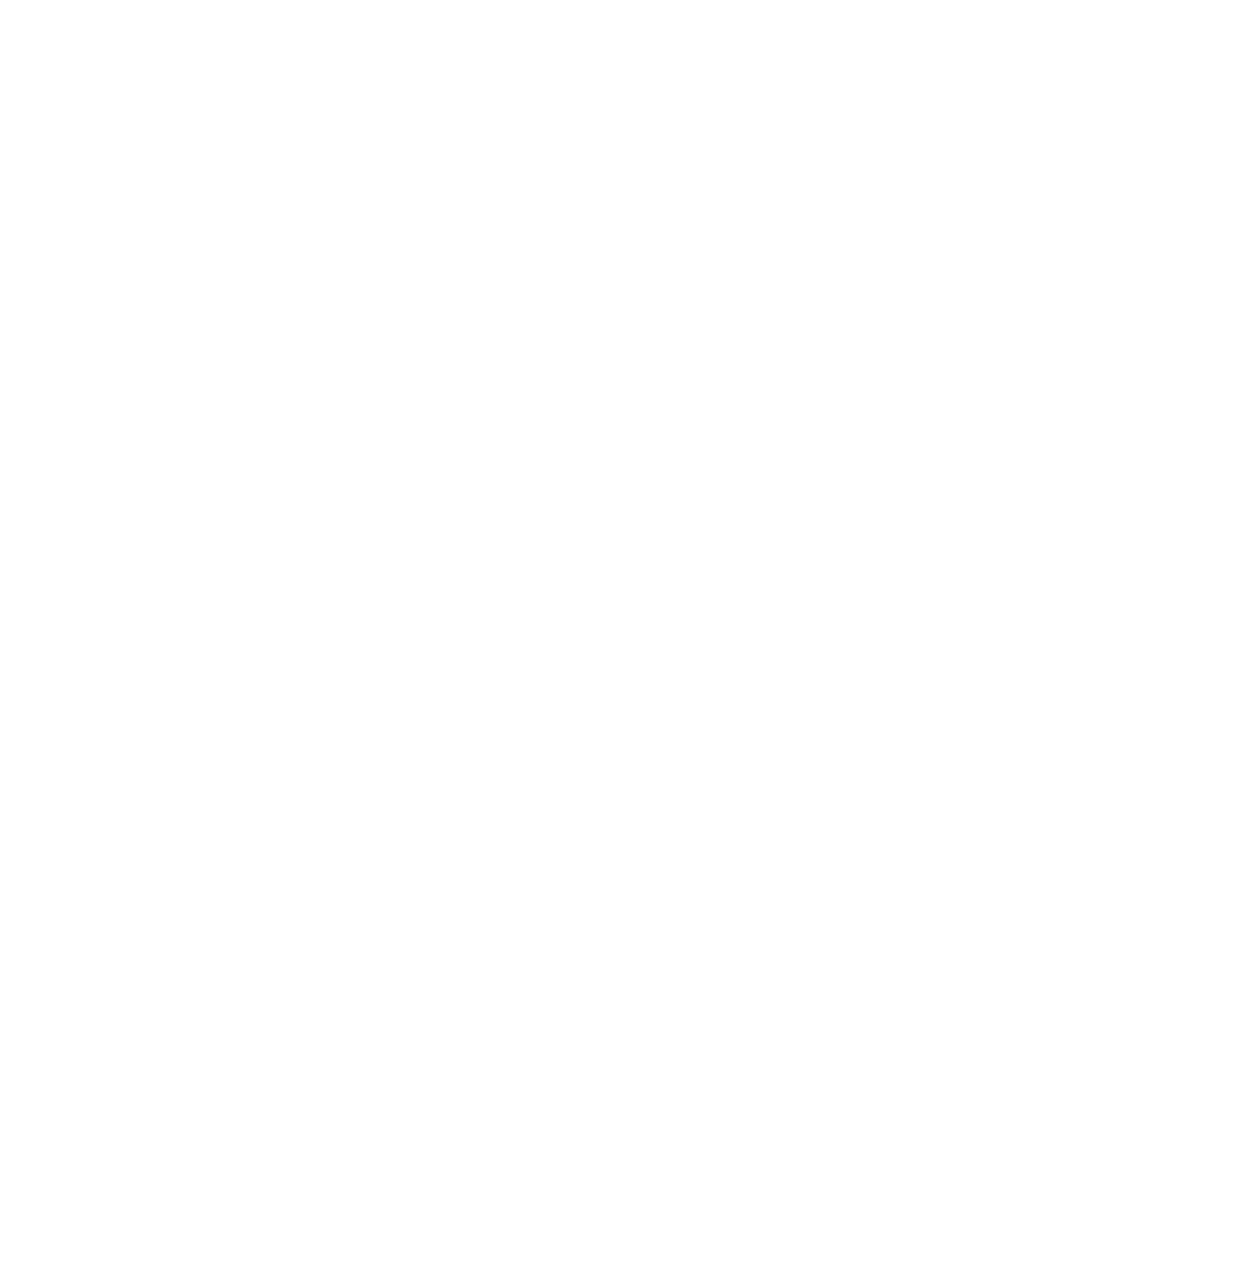 img-web-clientlist_white-logo copy 21.png